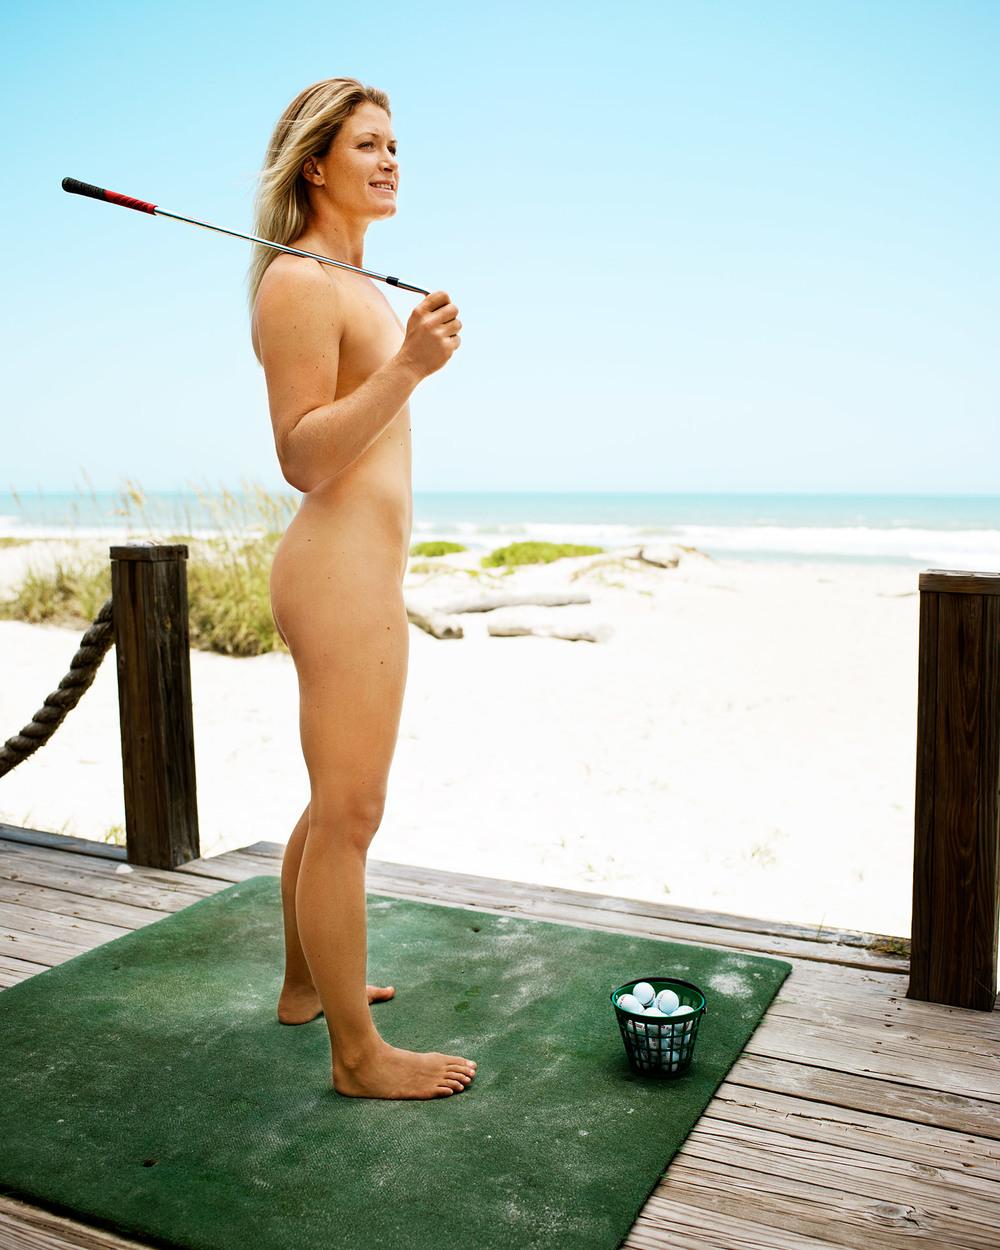 Suzann-Pettersen-LARGE-body-issue.jpg